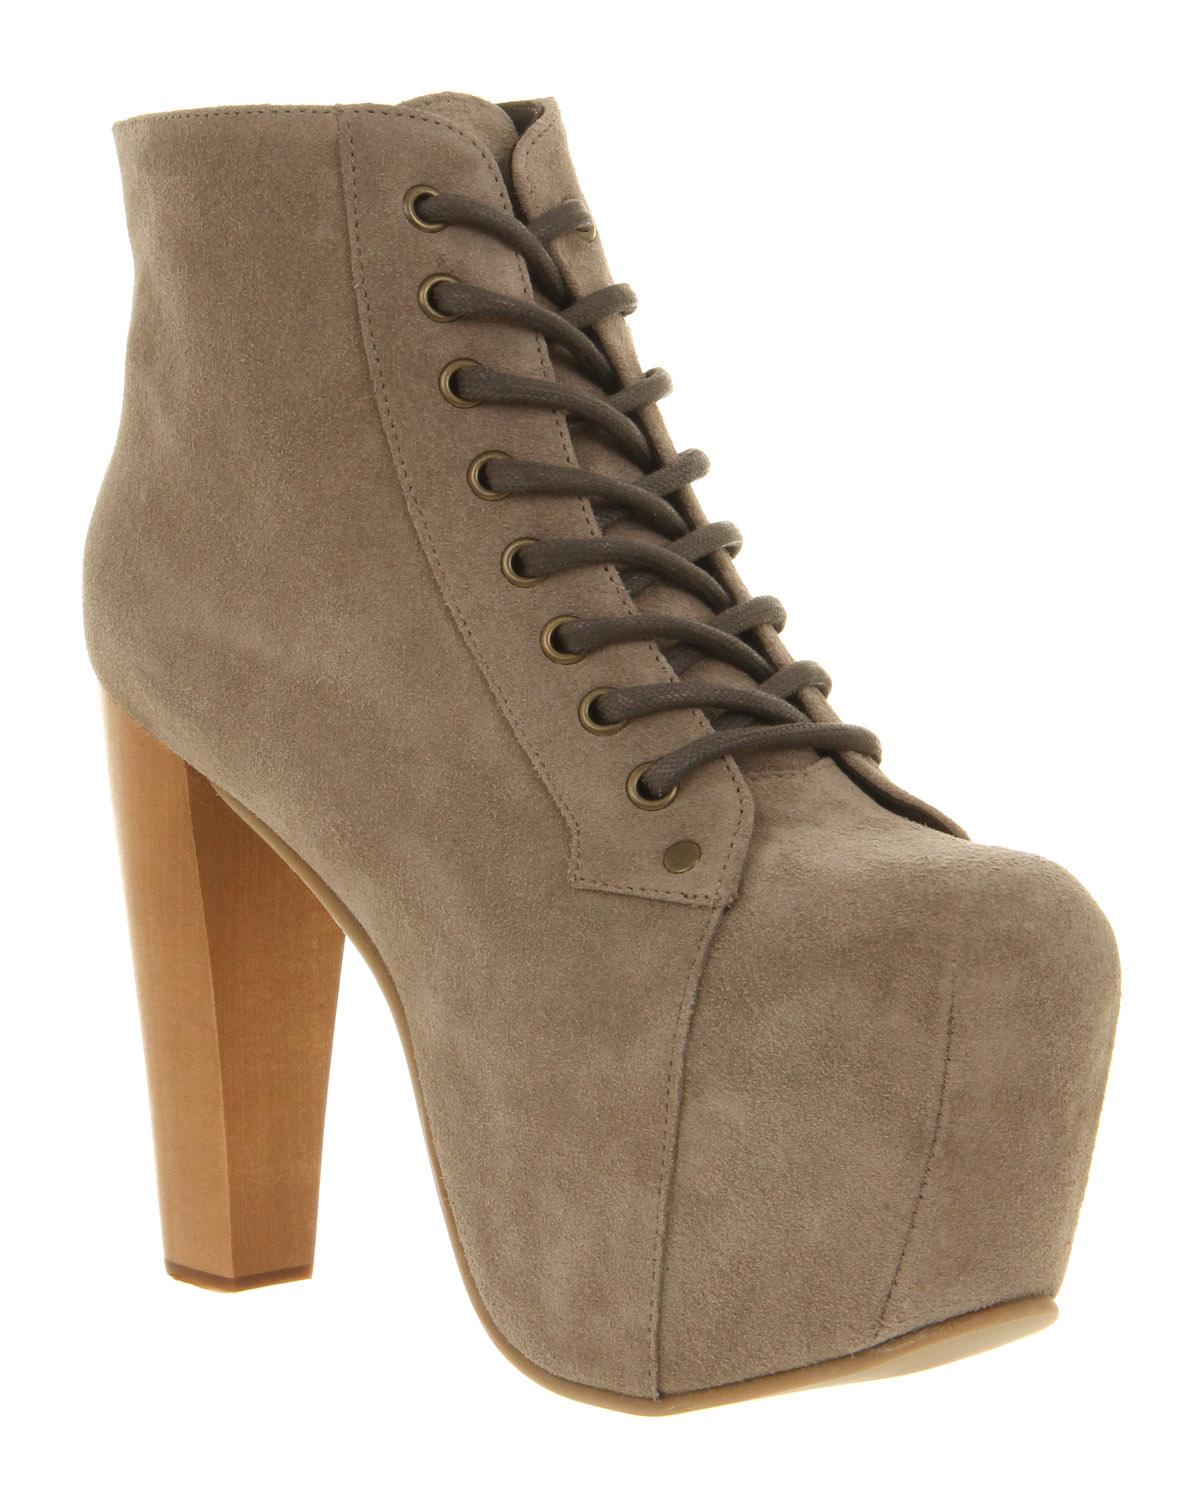 jeffrey campbell lita platform ankle boot grey suede in brown grey lyst. Black Bedroom Furniture Sets. Home Design Ideas